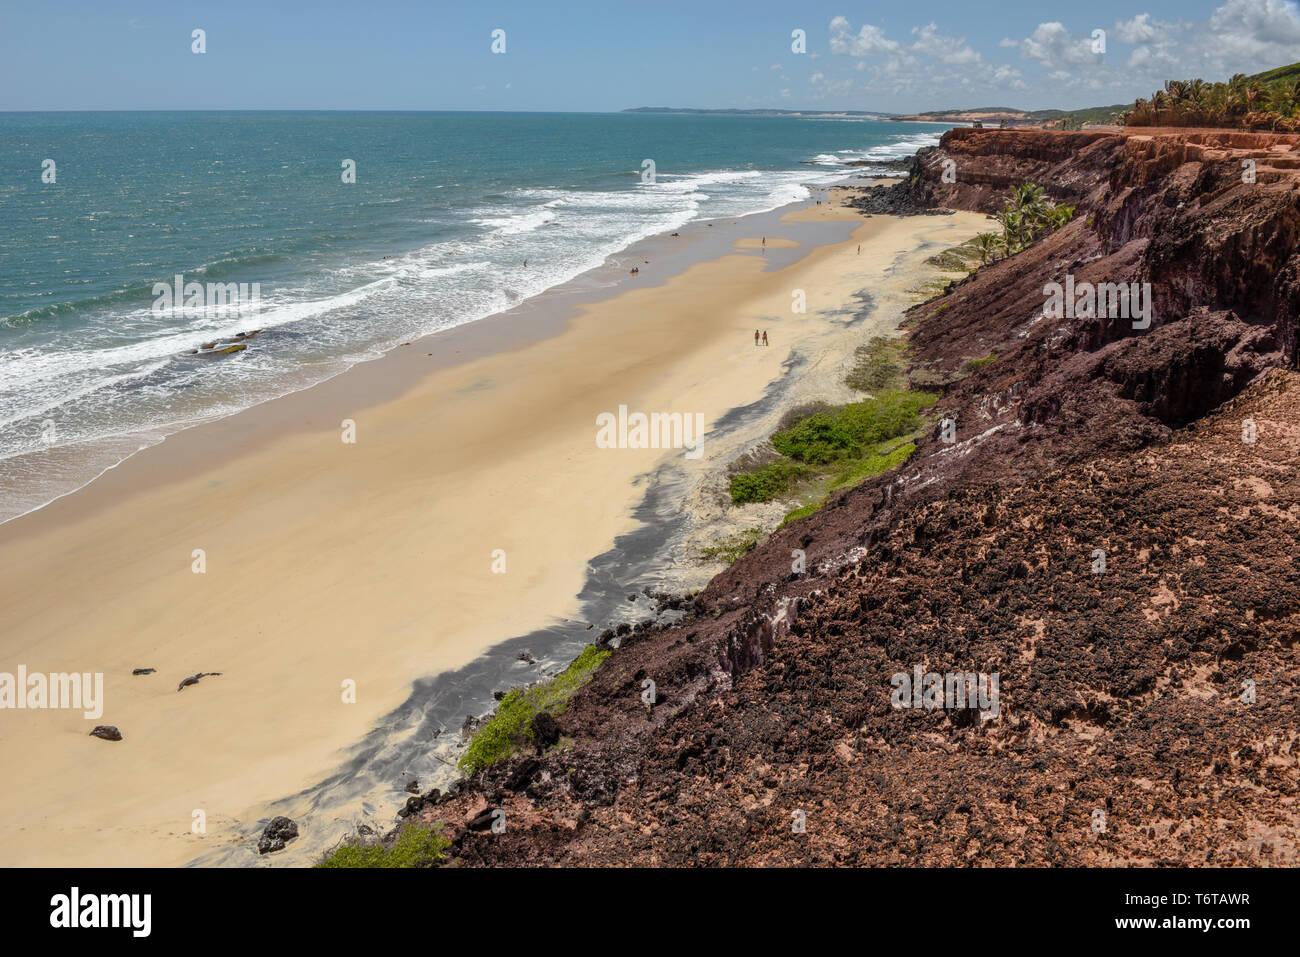 La preciosa playa de Praia do Amor cerca de Pipa en Brasil Imagen De Stock